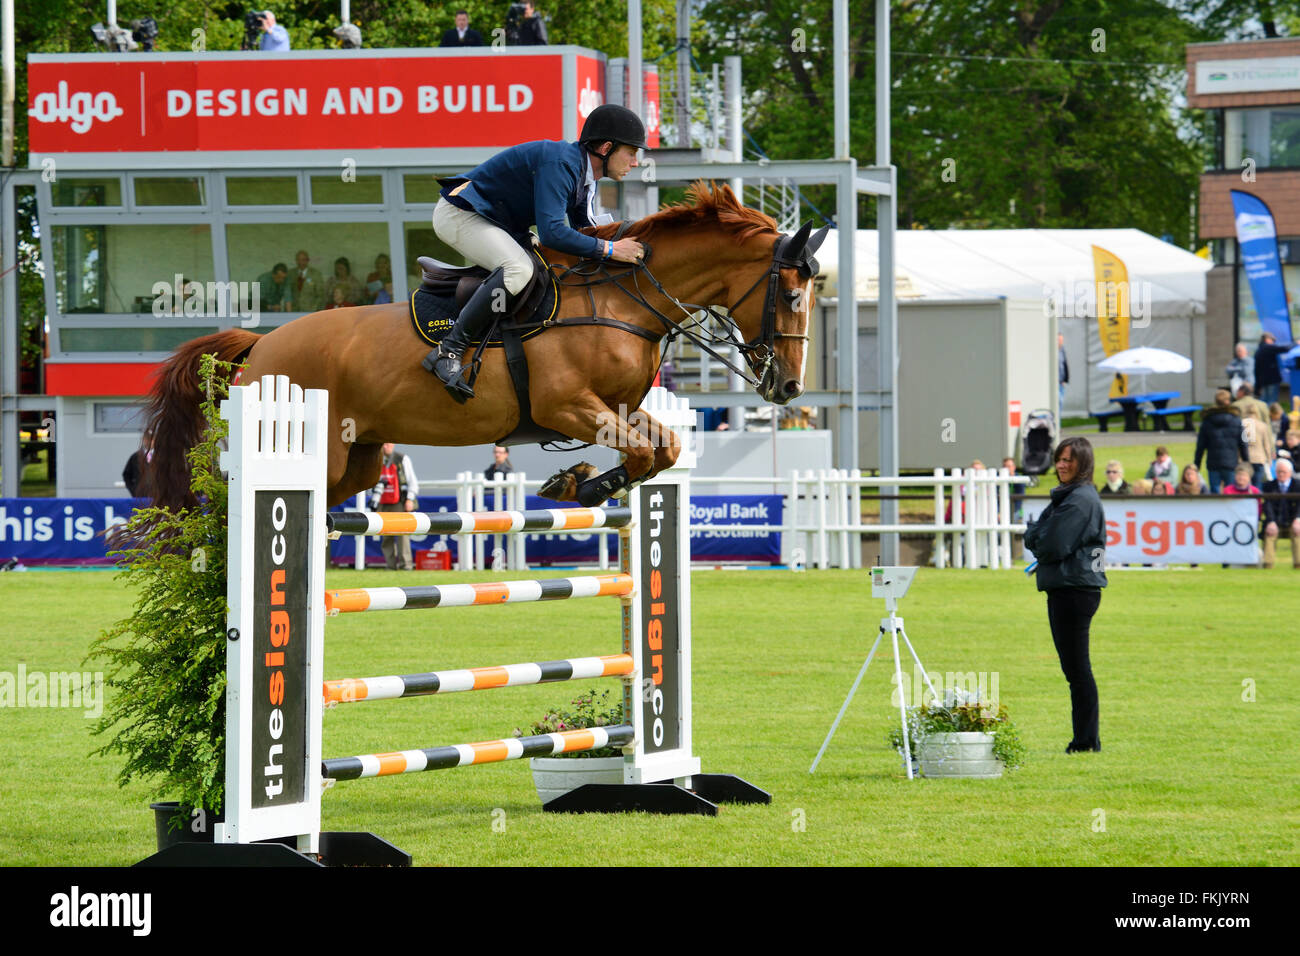 Show jumping at Royal Highland Show 2015, Ingliston, Edinburgh, Scotland, UK - Stock Image